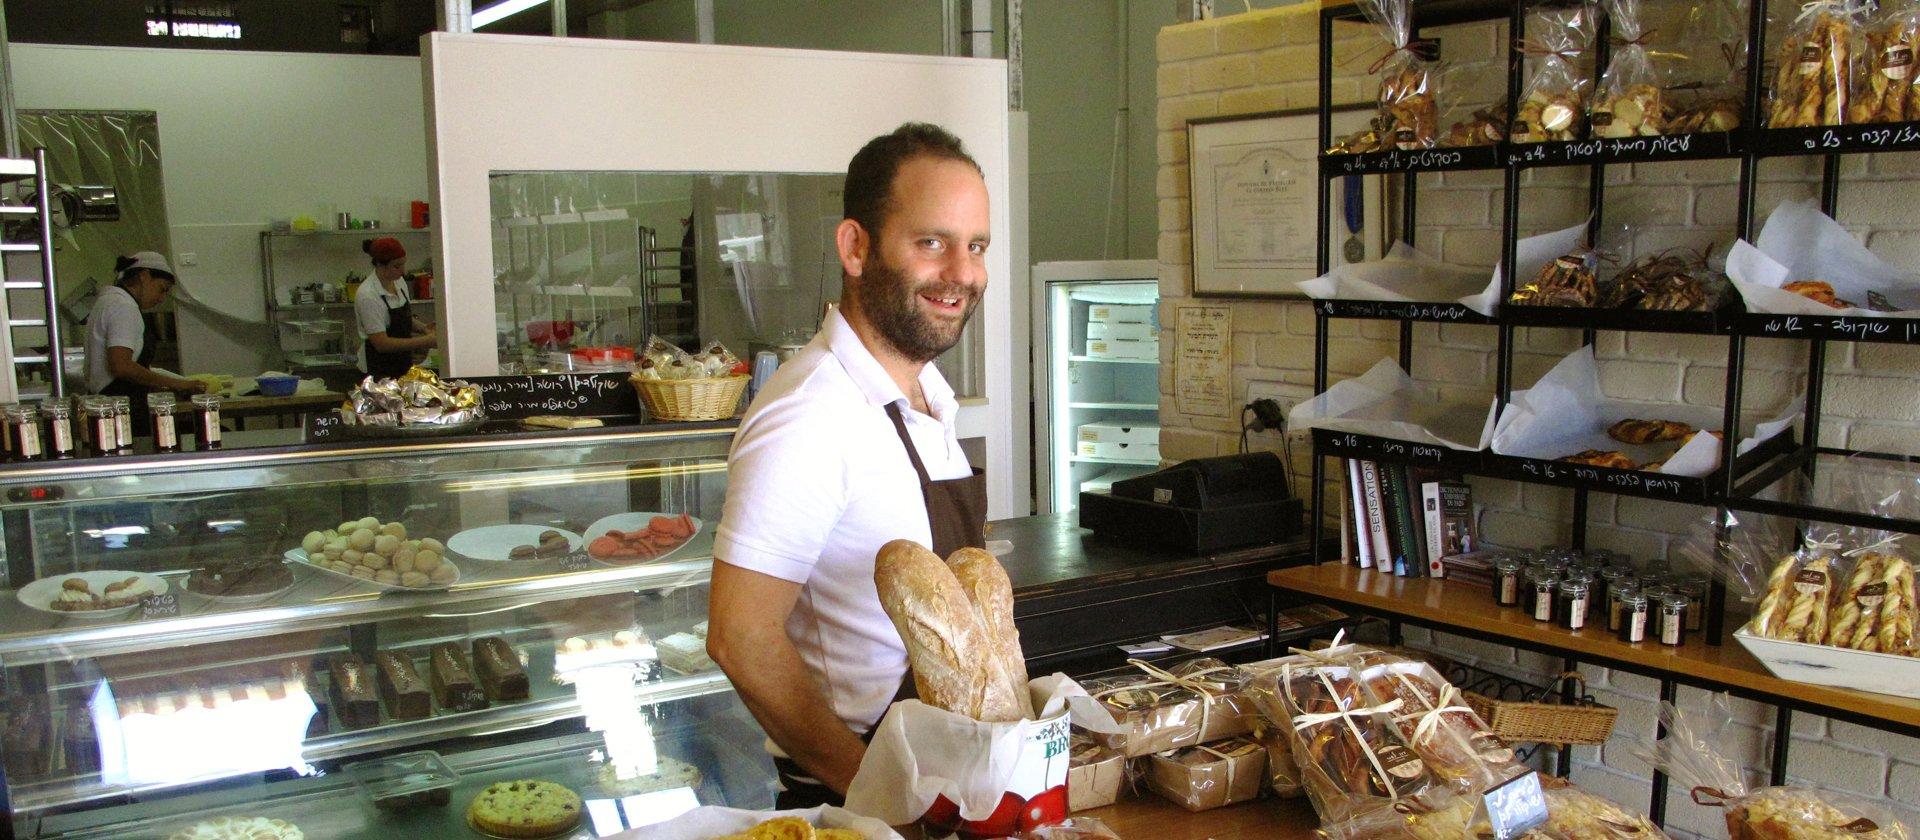 Chef David Laor